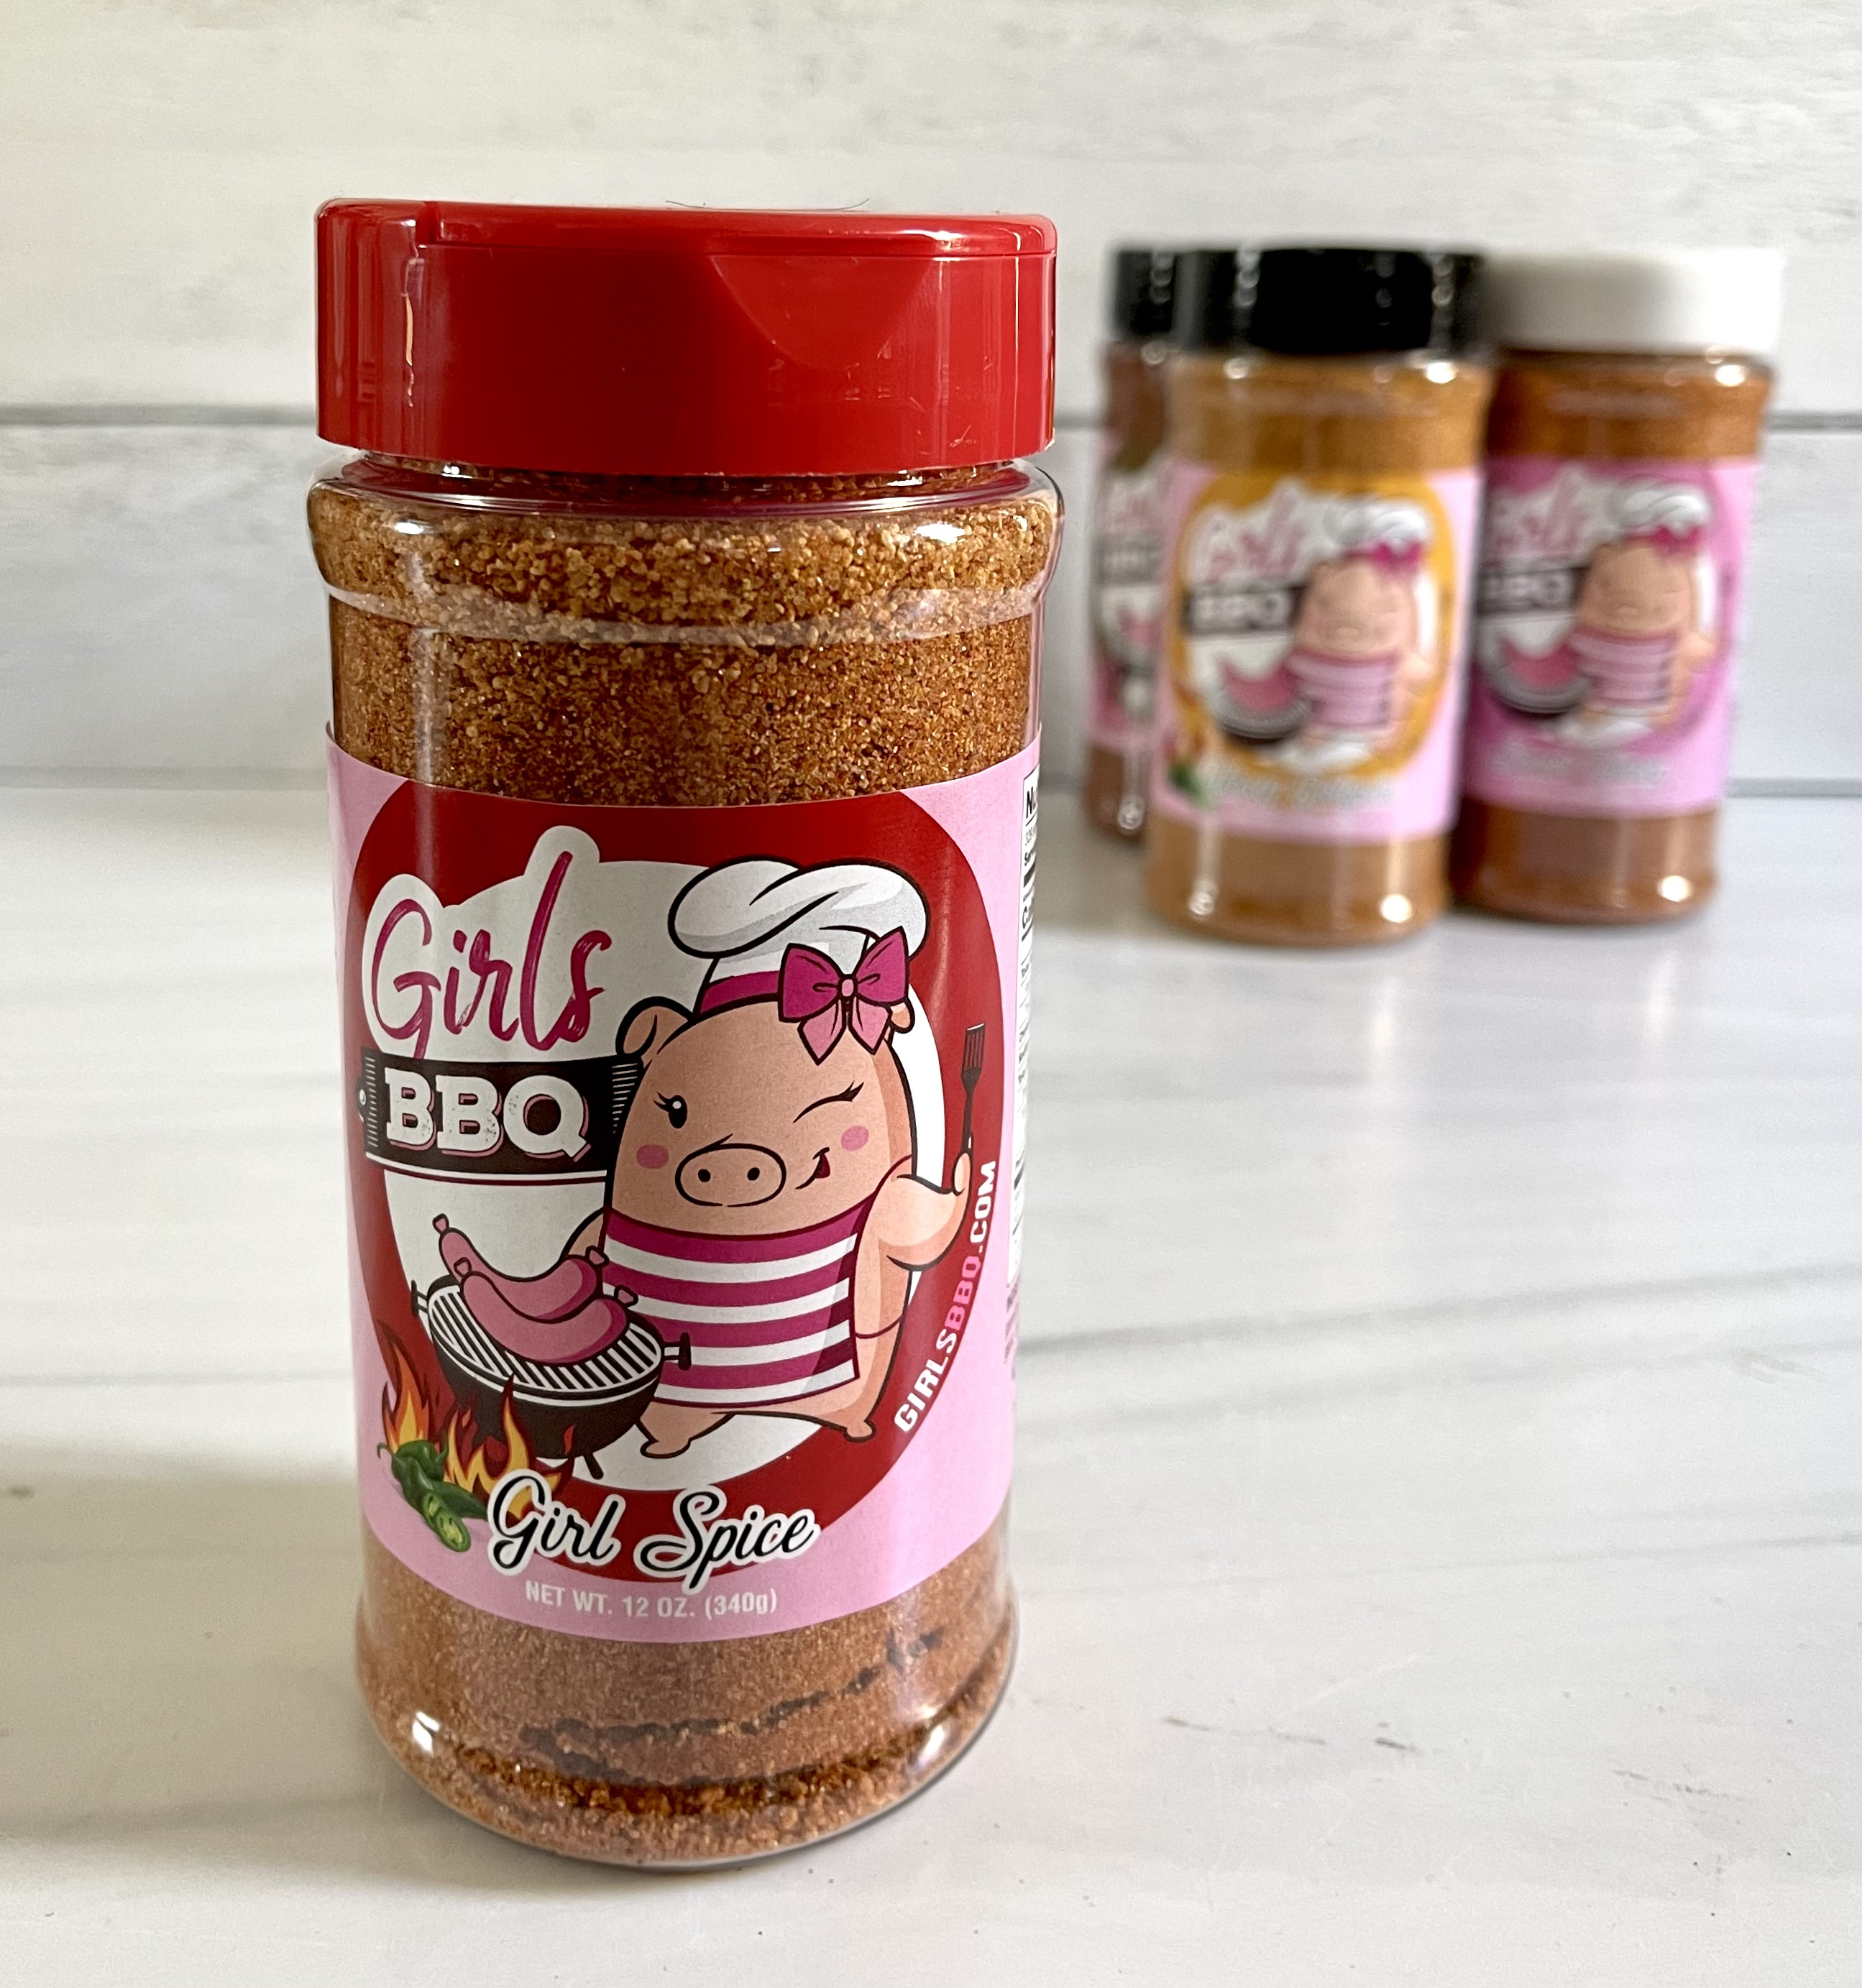 Girls BBQ Dry Rub, Girl Spice